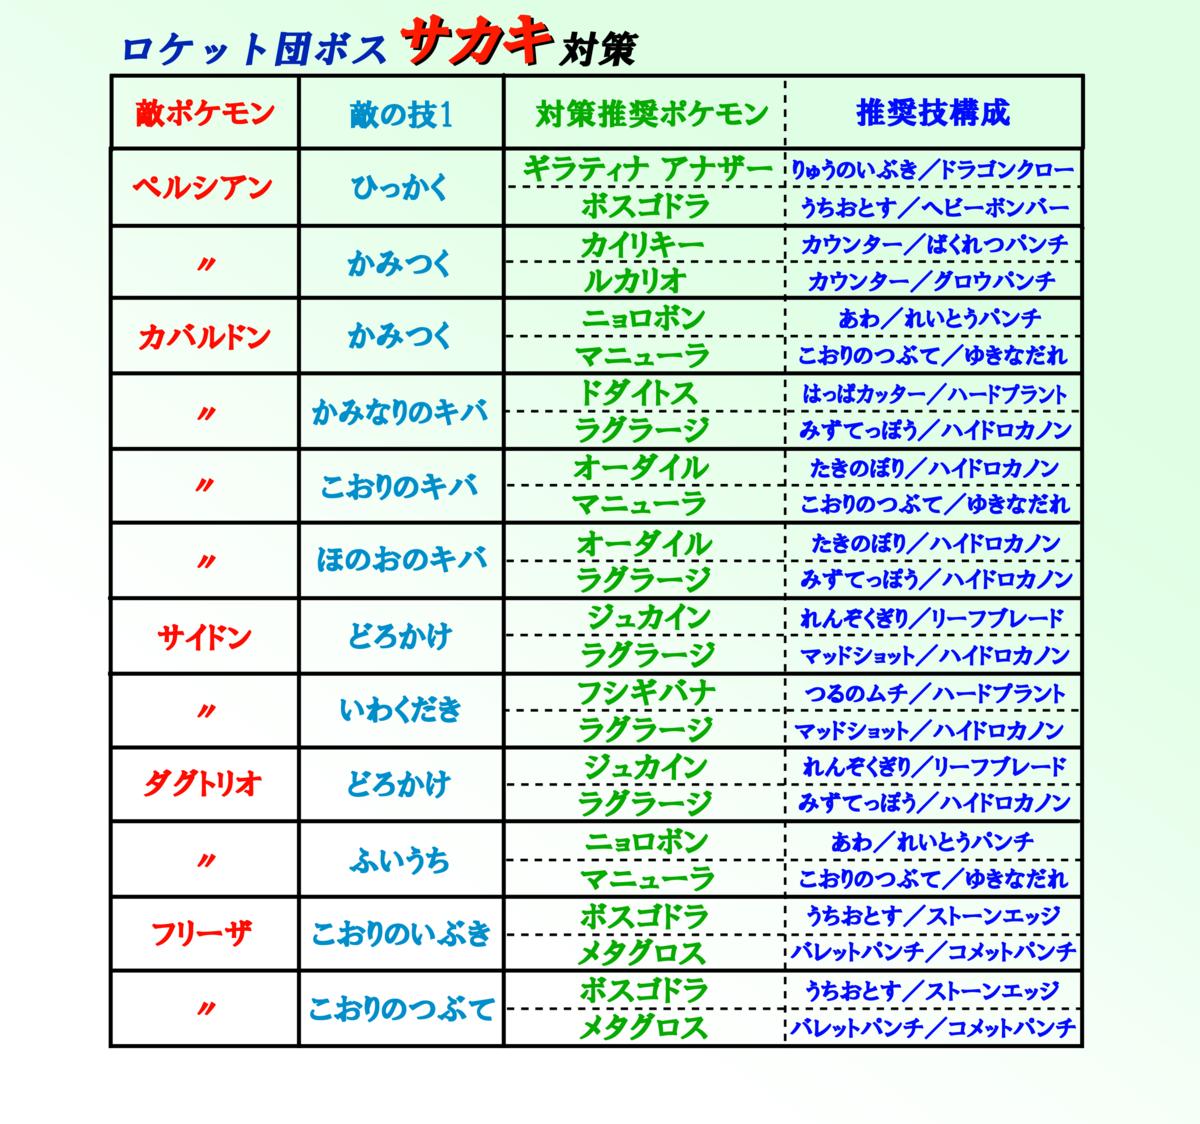 f:id:Kazumin0331:20191116034435p:plain